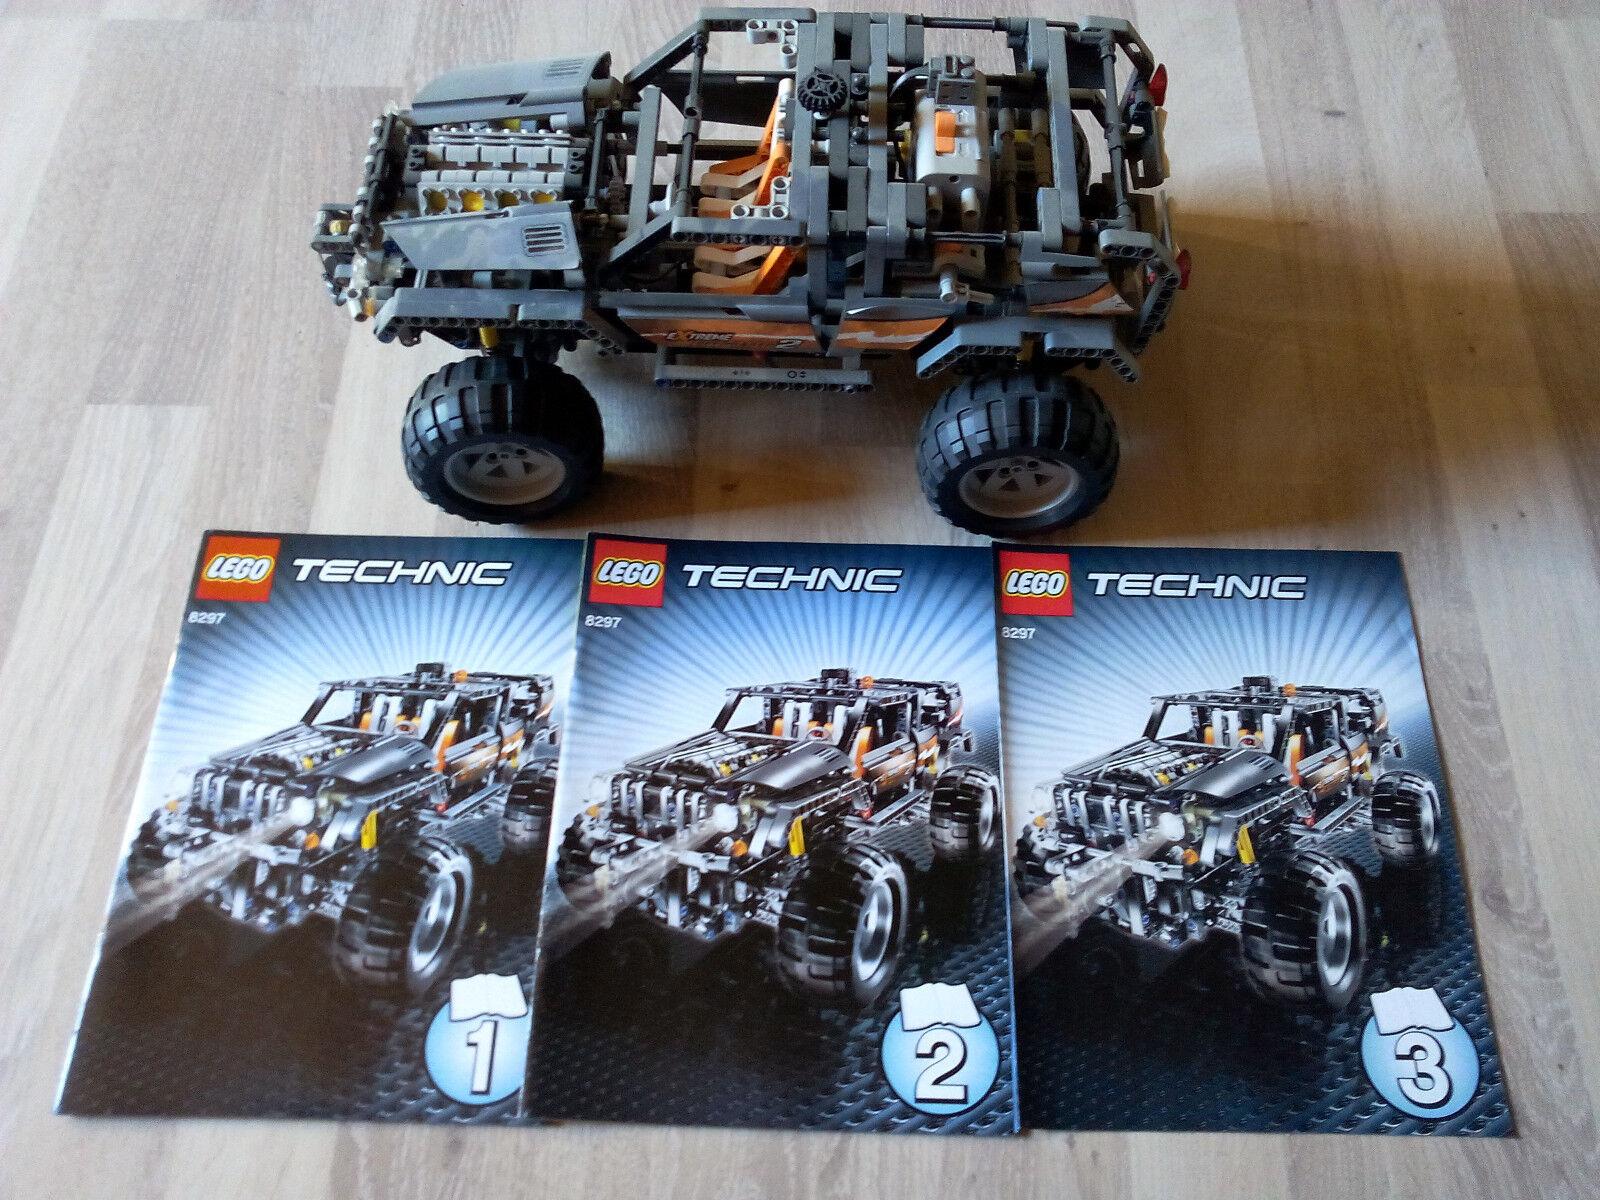 Lego Technic Technik 8297 Off Roader   GUTER ZUSTAND - RARITÄT